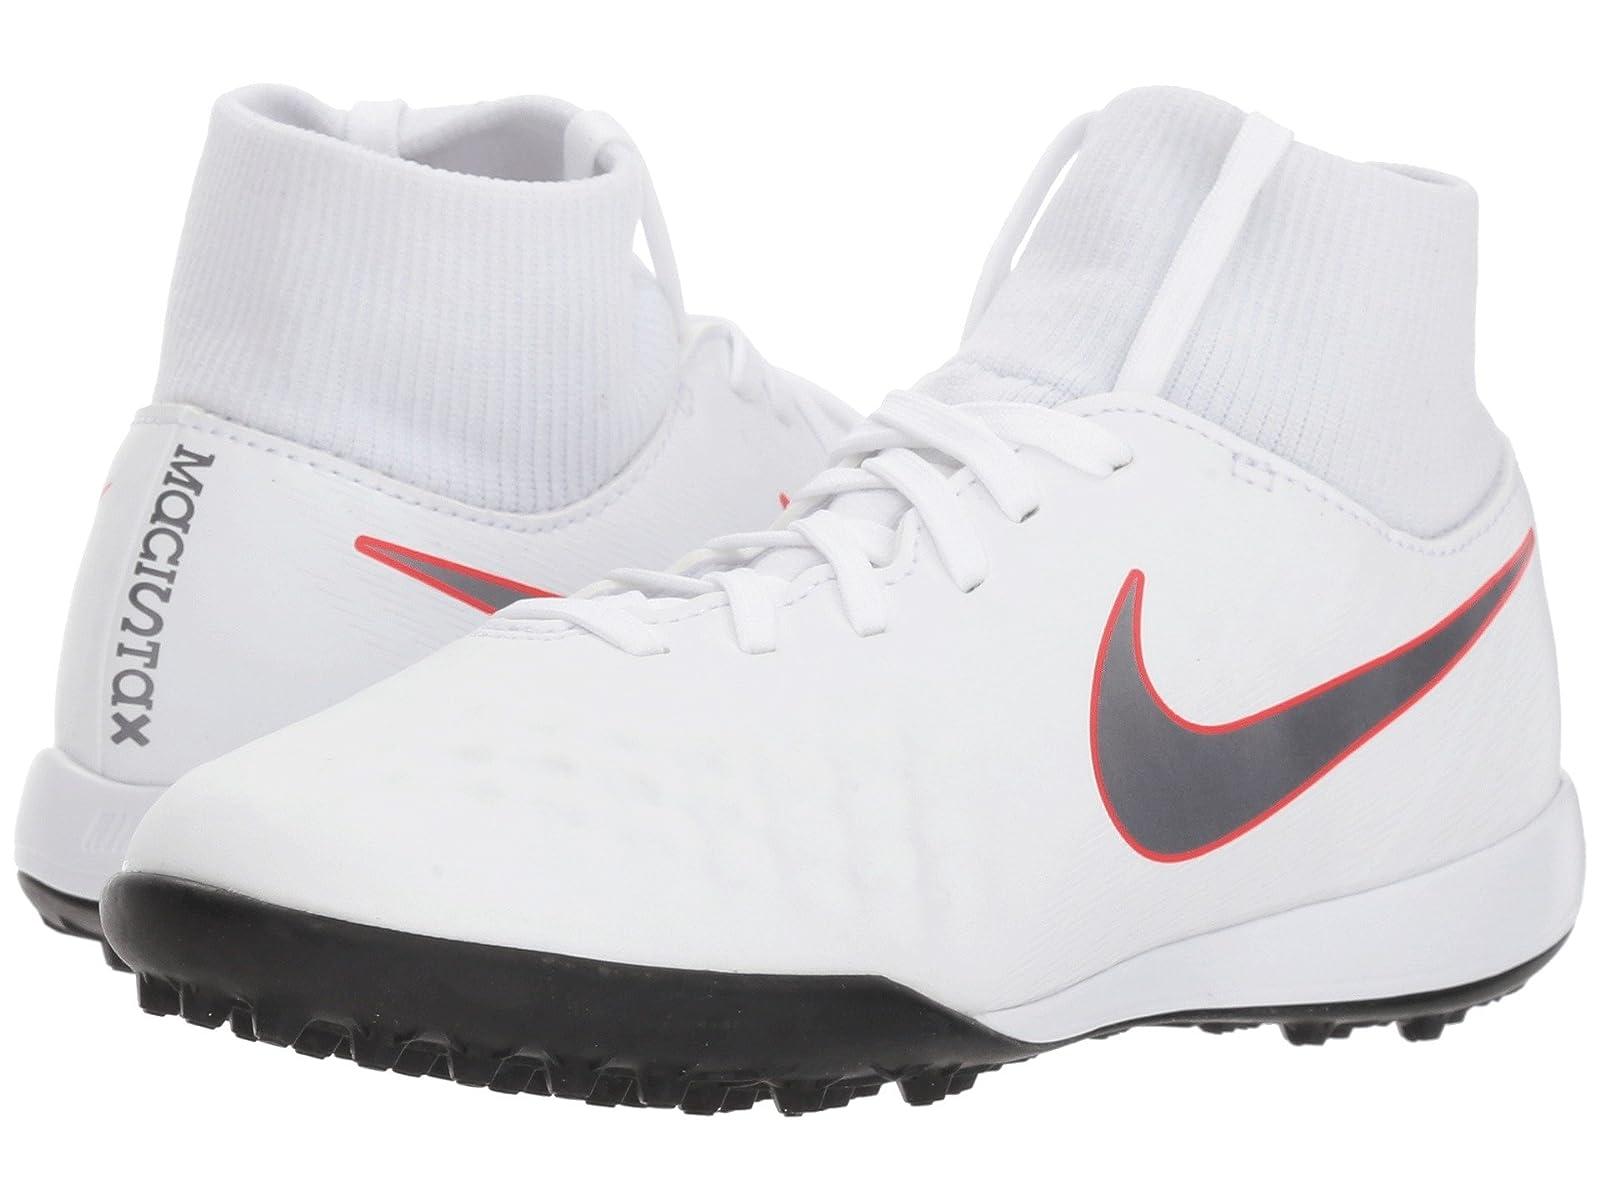 Nike Kids Jr. Magista ObraX 2 Academy Dynamic Fit TF Soccer (Little Kid/Big Kid)Atmospheric grades have affordable shoes